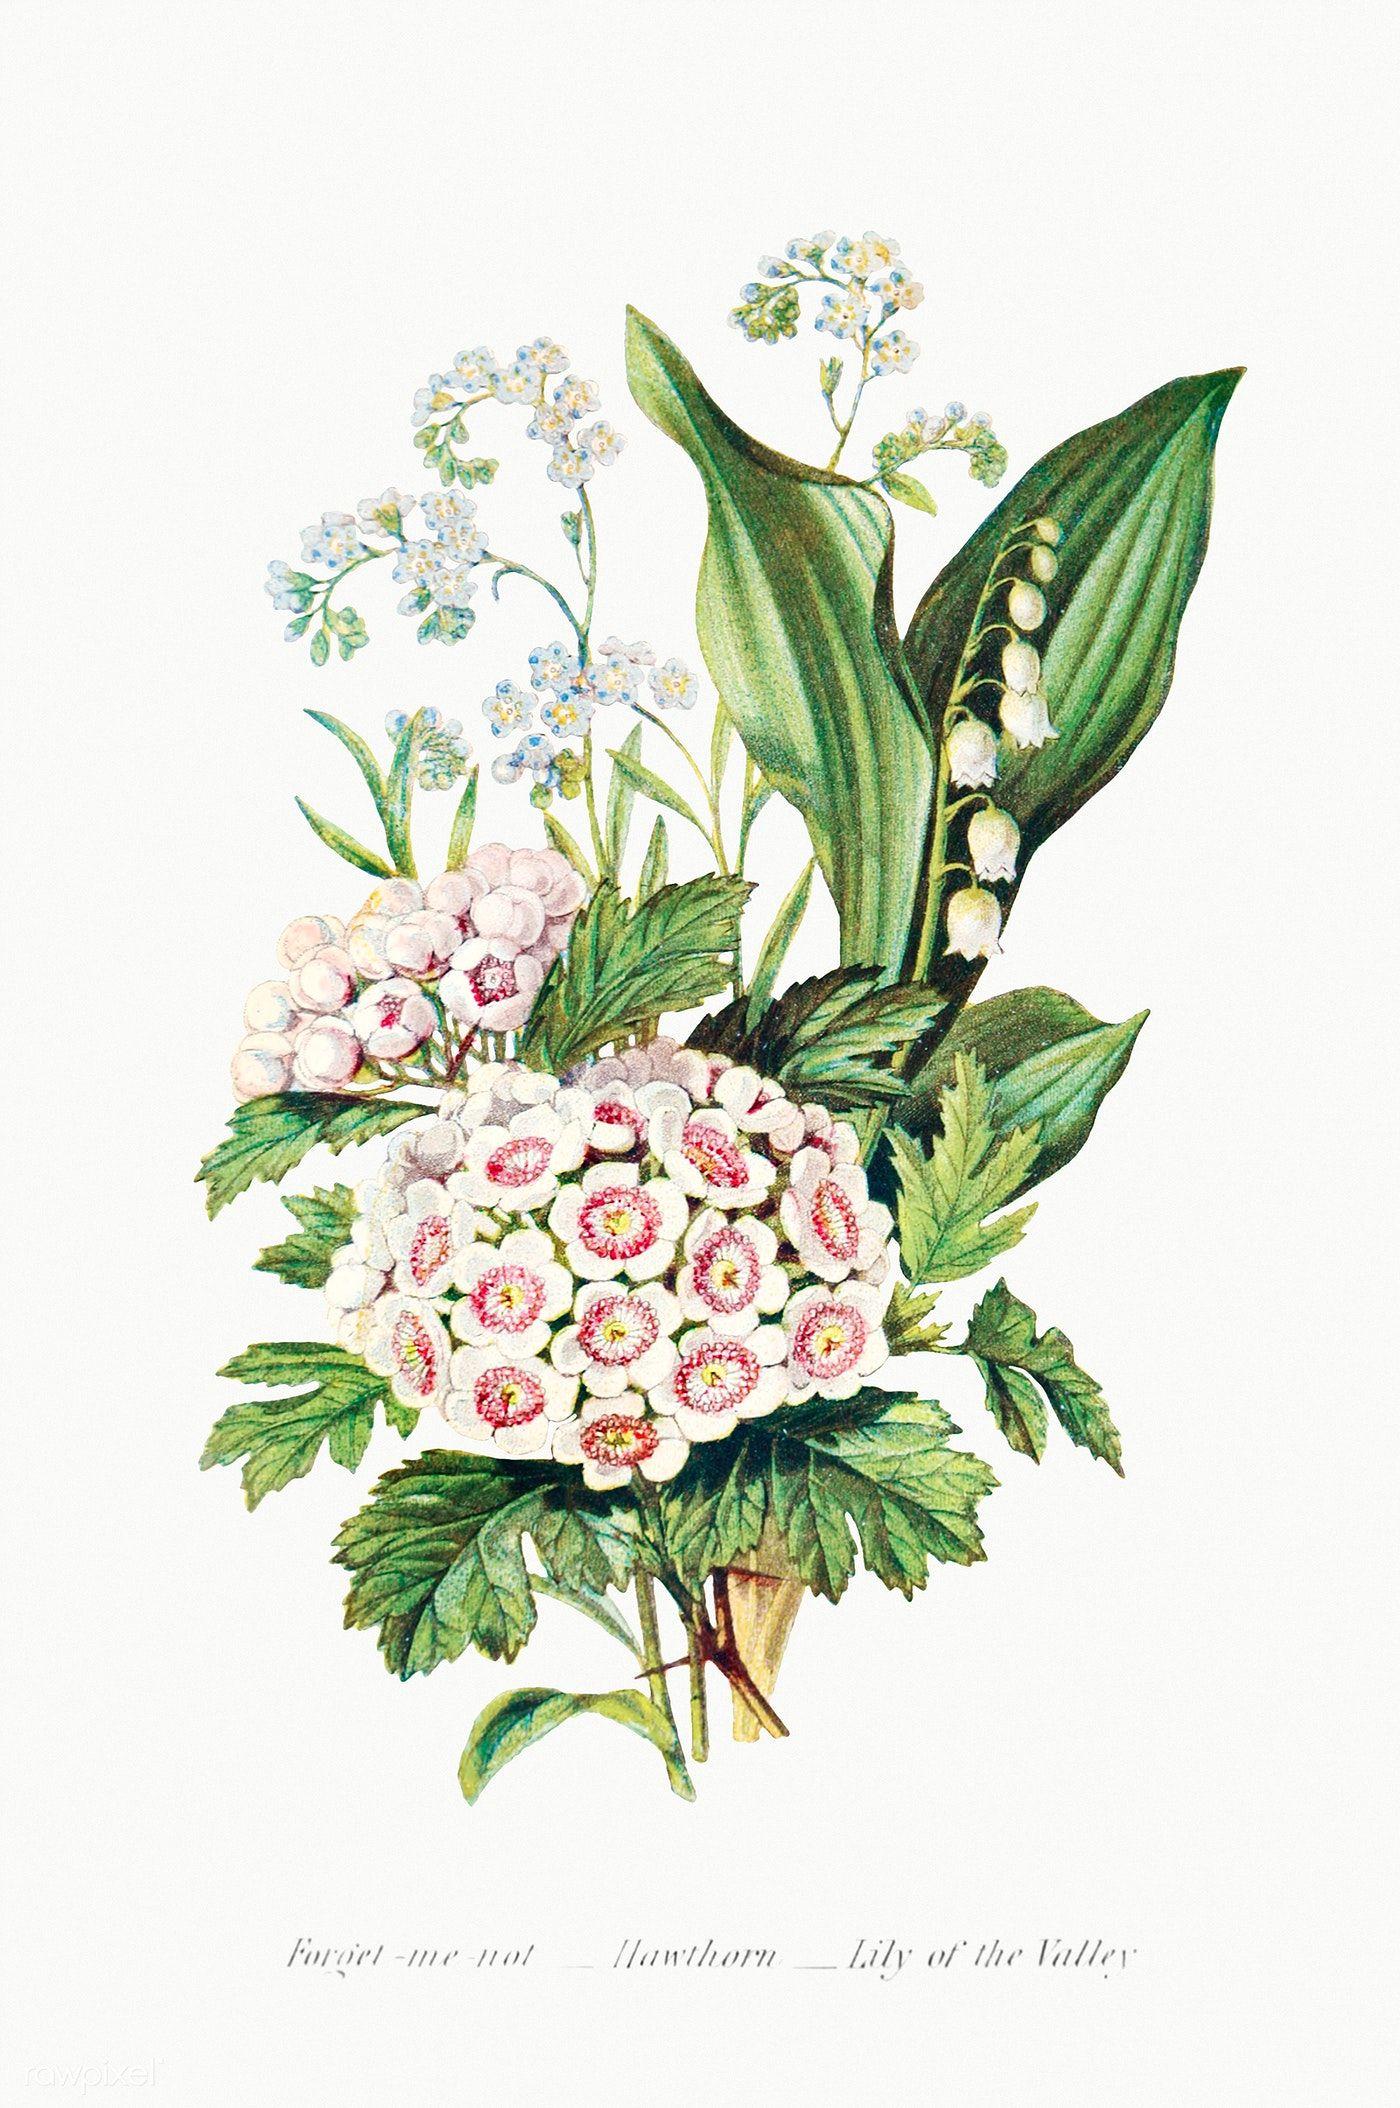 Vintage Flower Bouquet Mockup Premium Image By Rawpixel Com In 2020 Summer Flower Bouquet Flower Illustration Flowers Bouquet